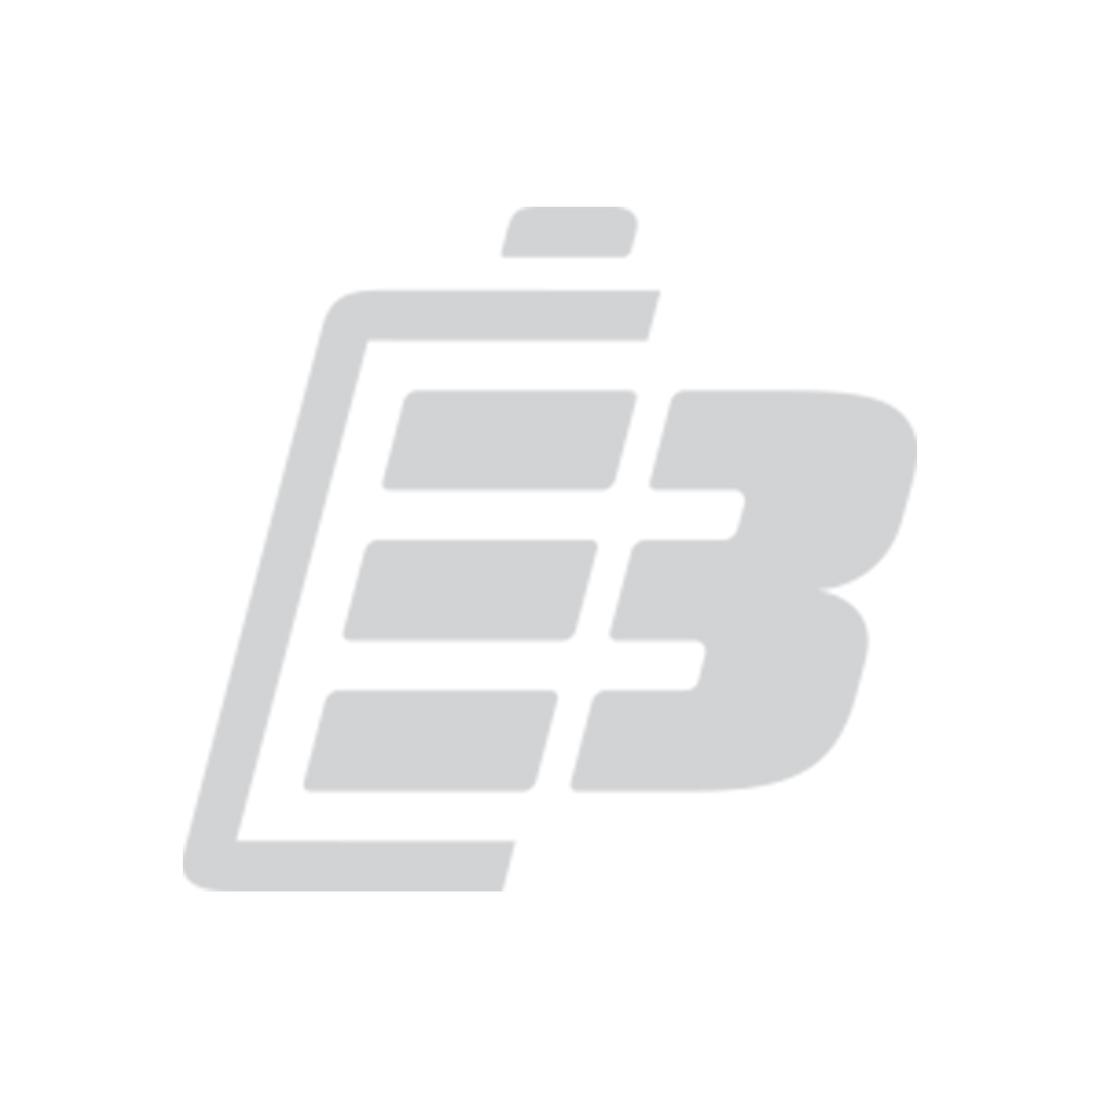 Duracell AAA 4PCs